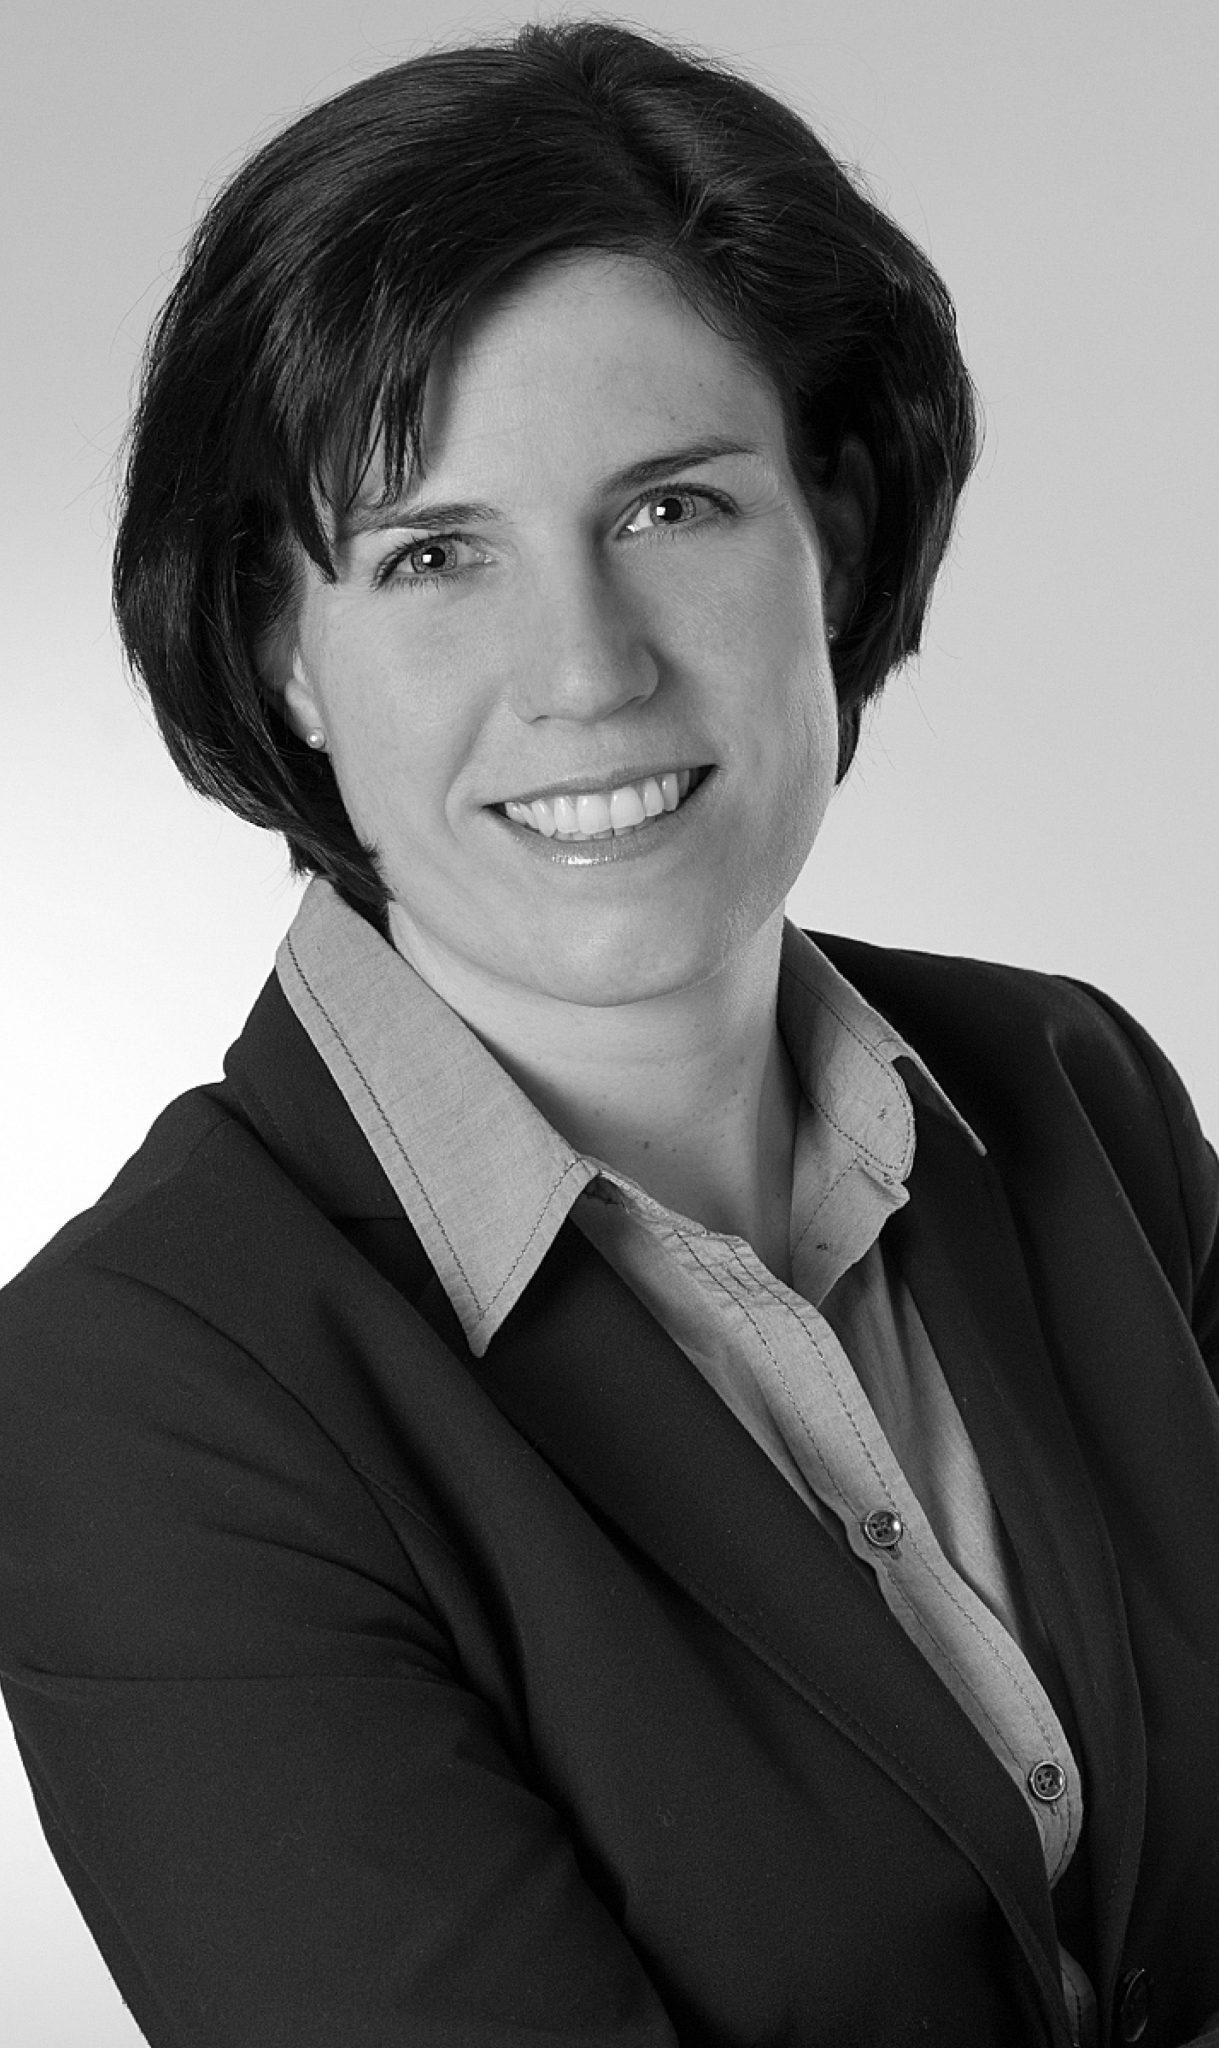 Bettina Freihofer Estrada mitPlan